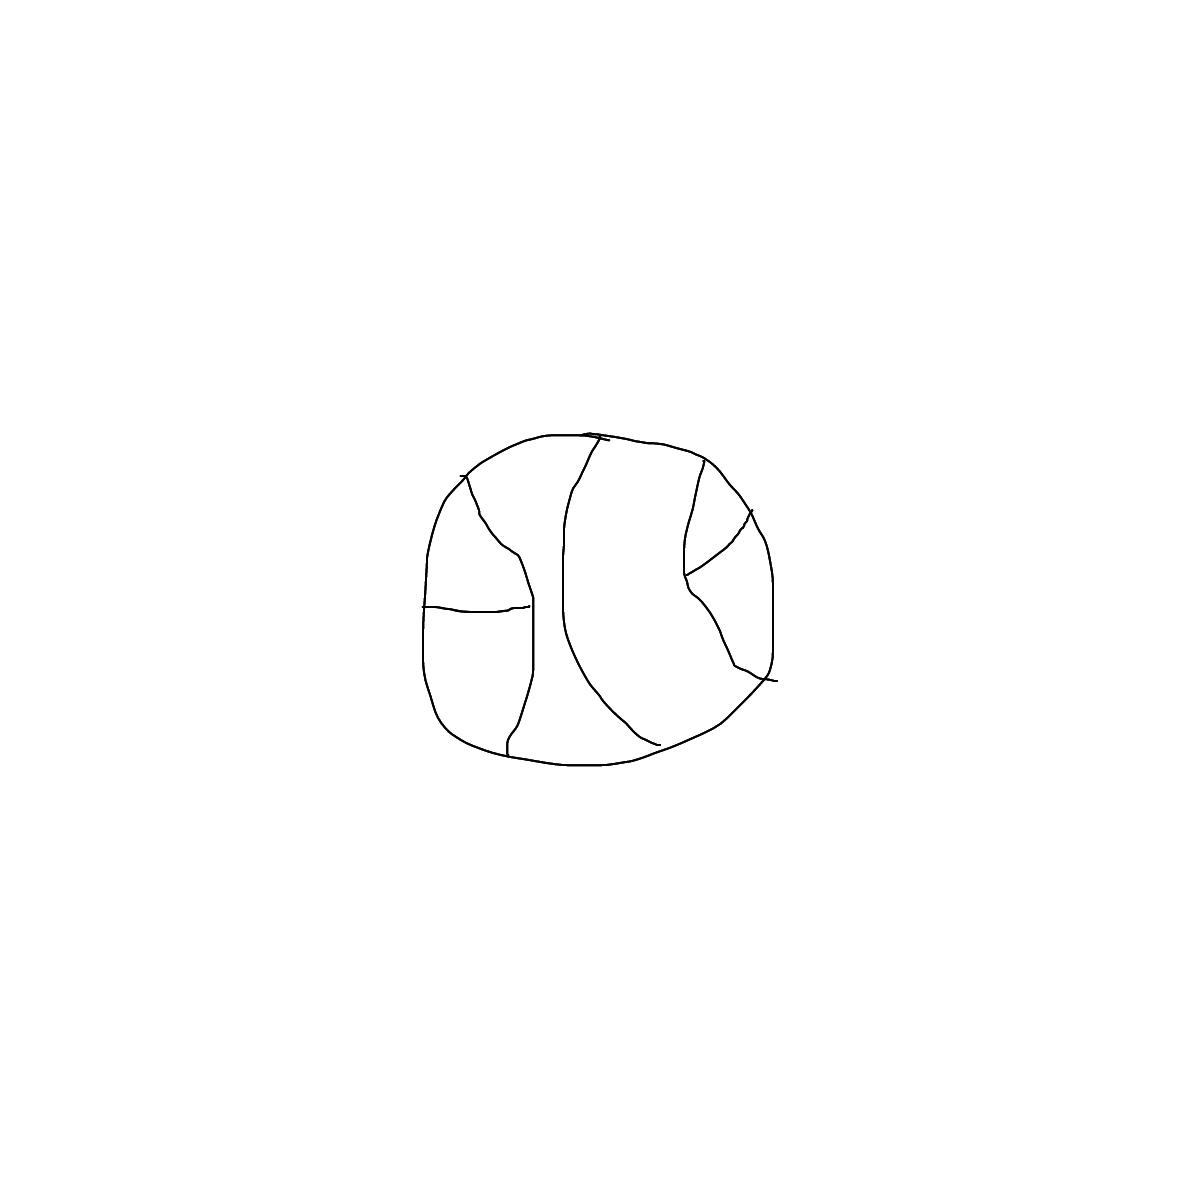 BAAAM drawing#24273 lat:43.2552604675293000lng: 21.8339519500732420